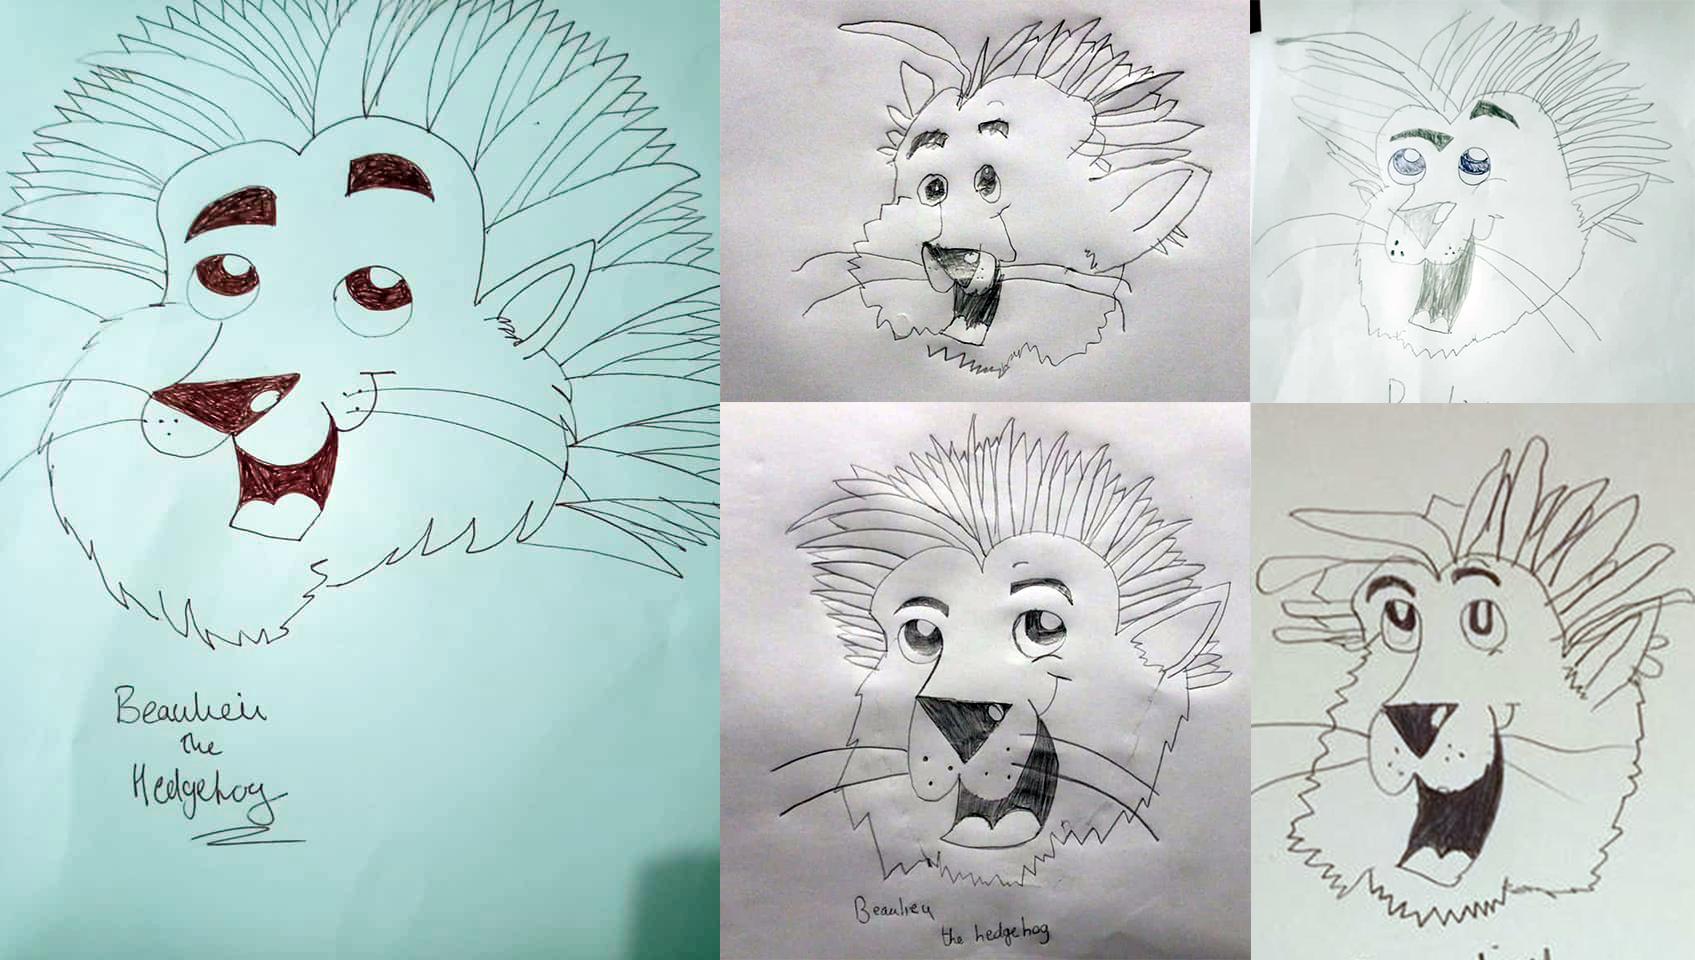 Children's drawings of Beaulieu The Hedgehog